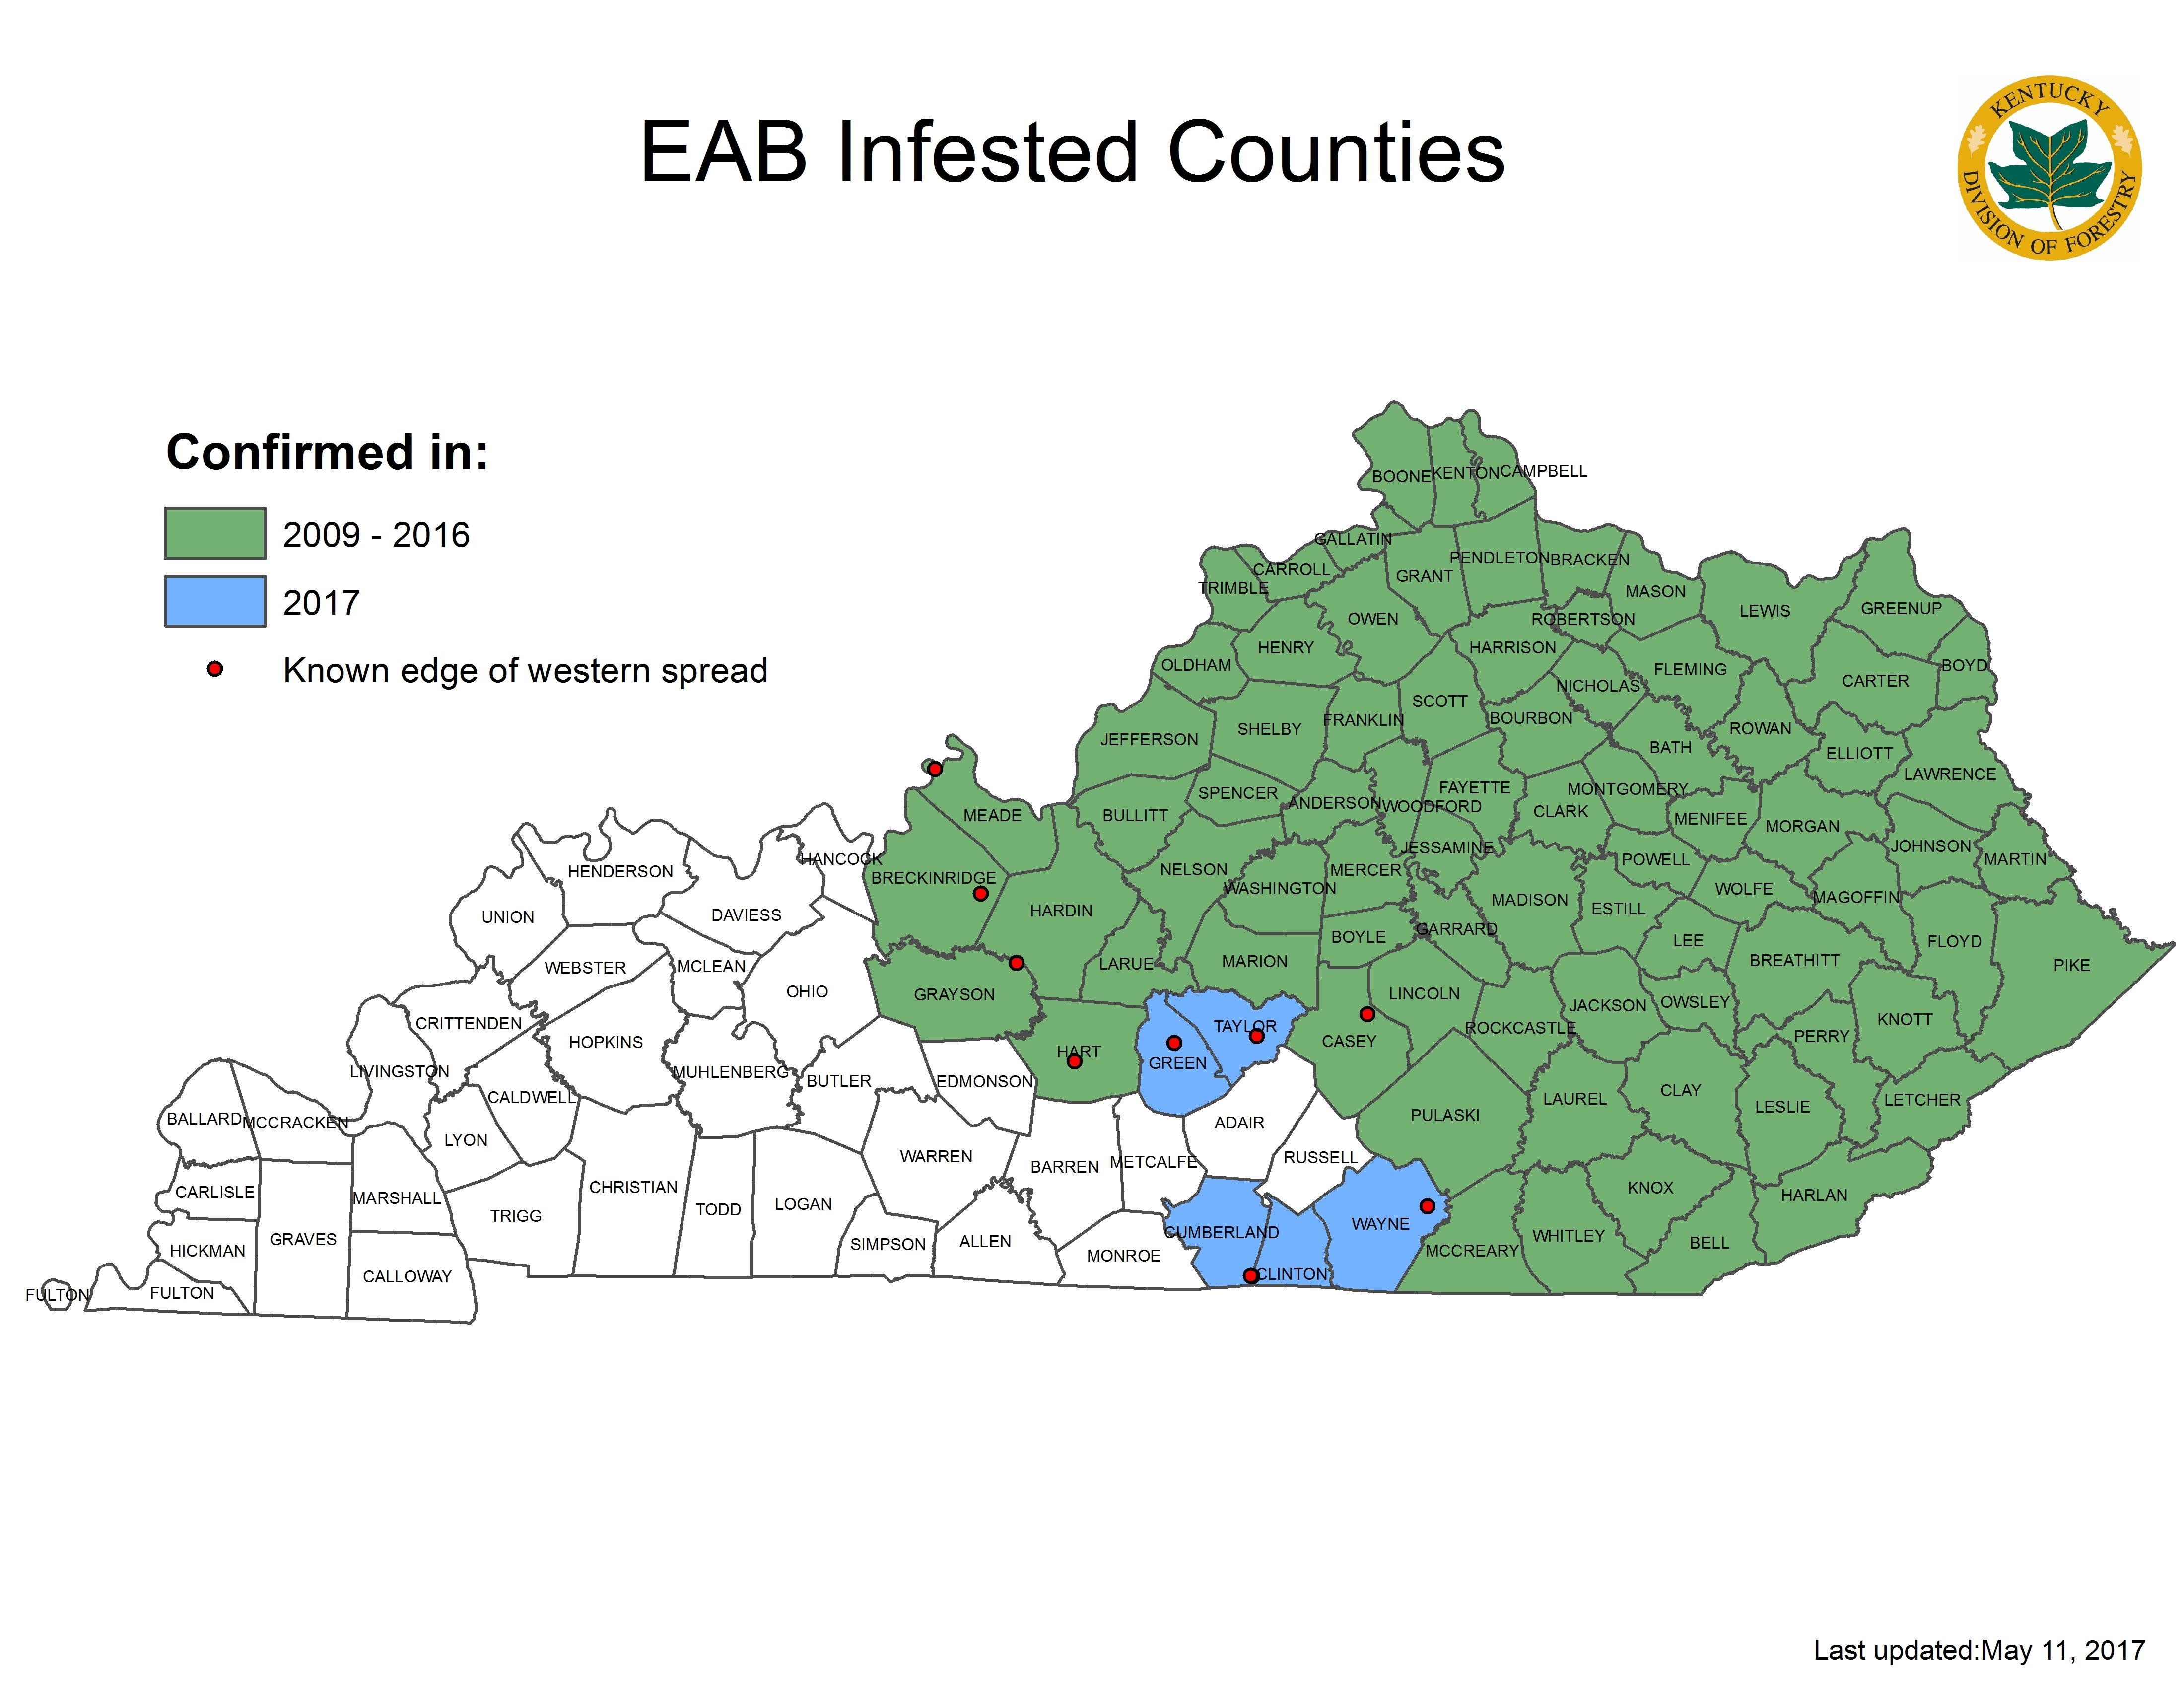 New County Reports Of Emerald Ash Borer Kentucky Pest News - Emerald ash borer map